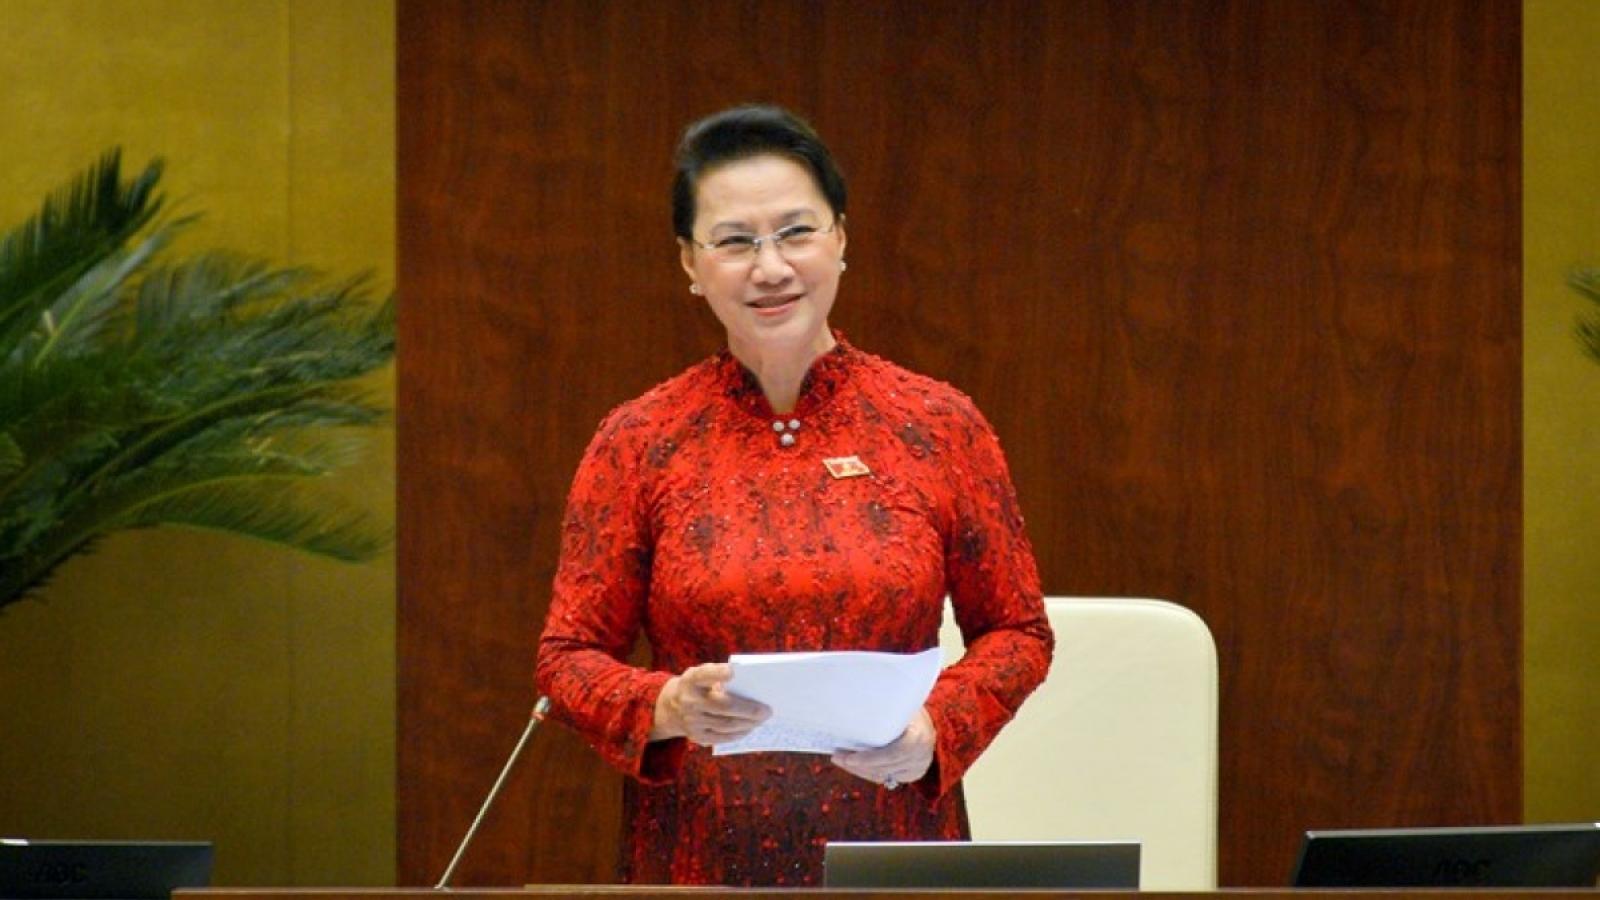 NA dismisses incumbent leader, prepares to elect new head